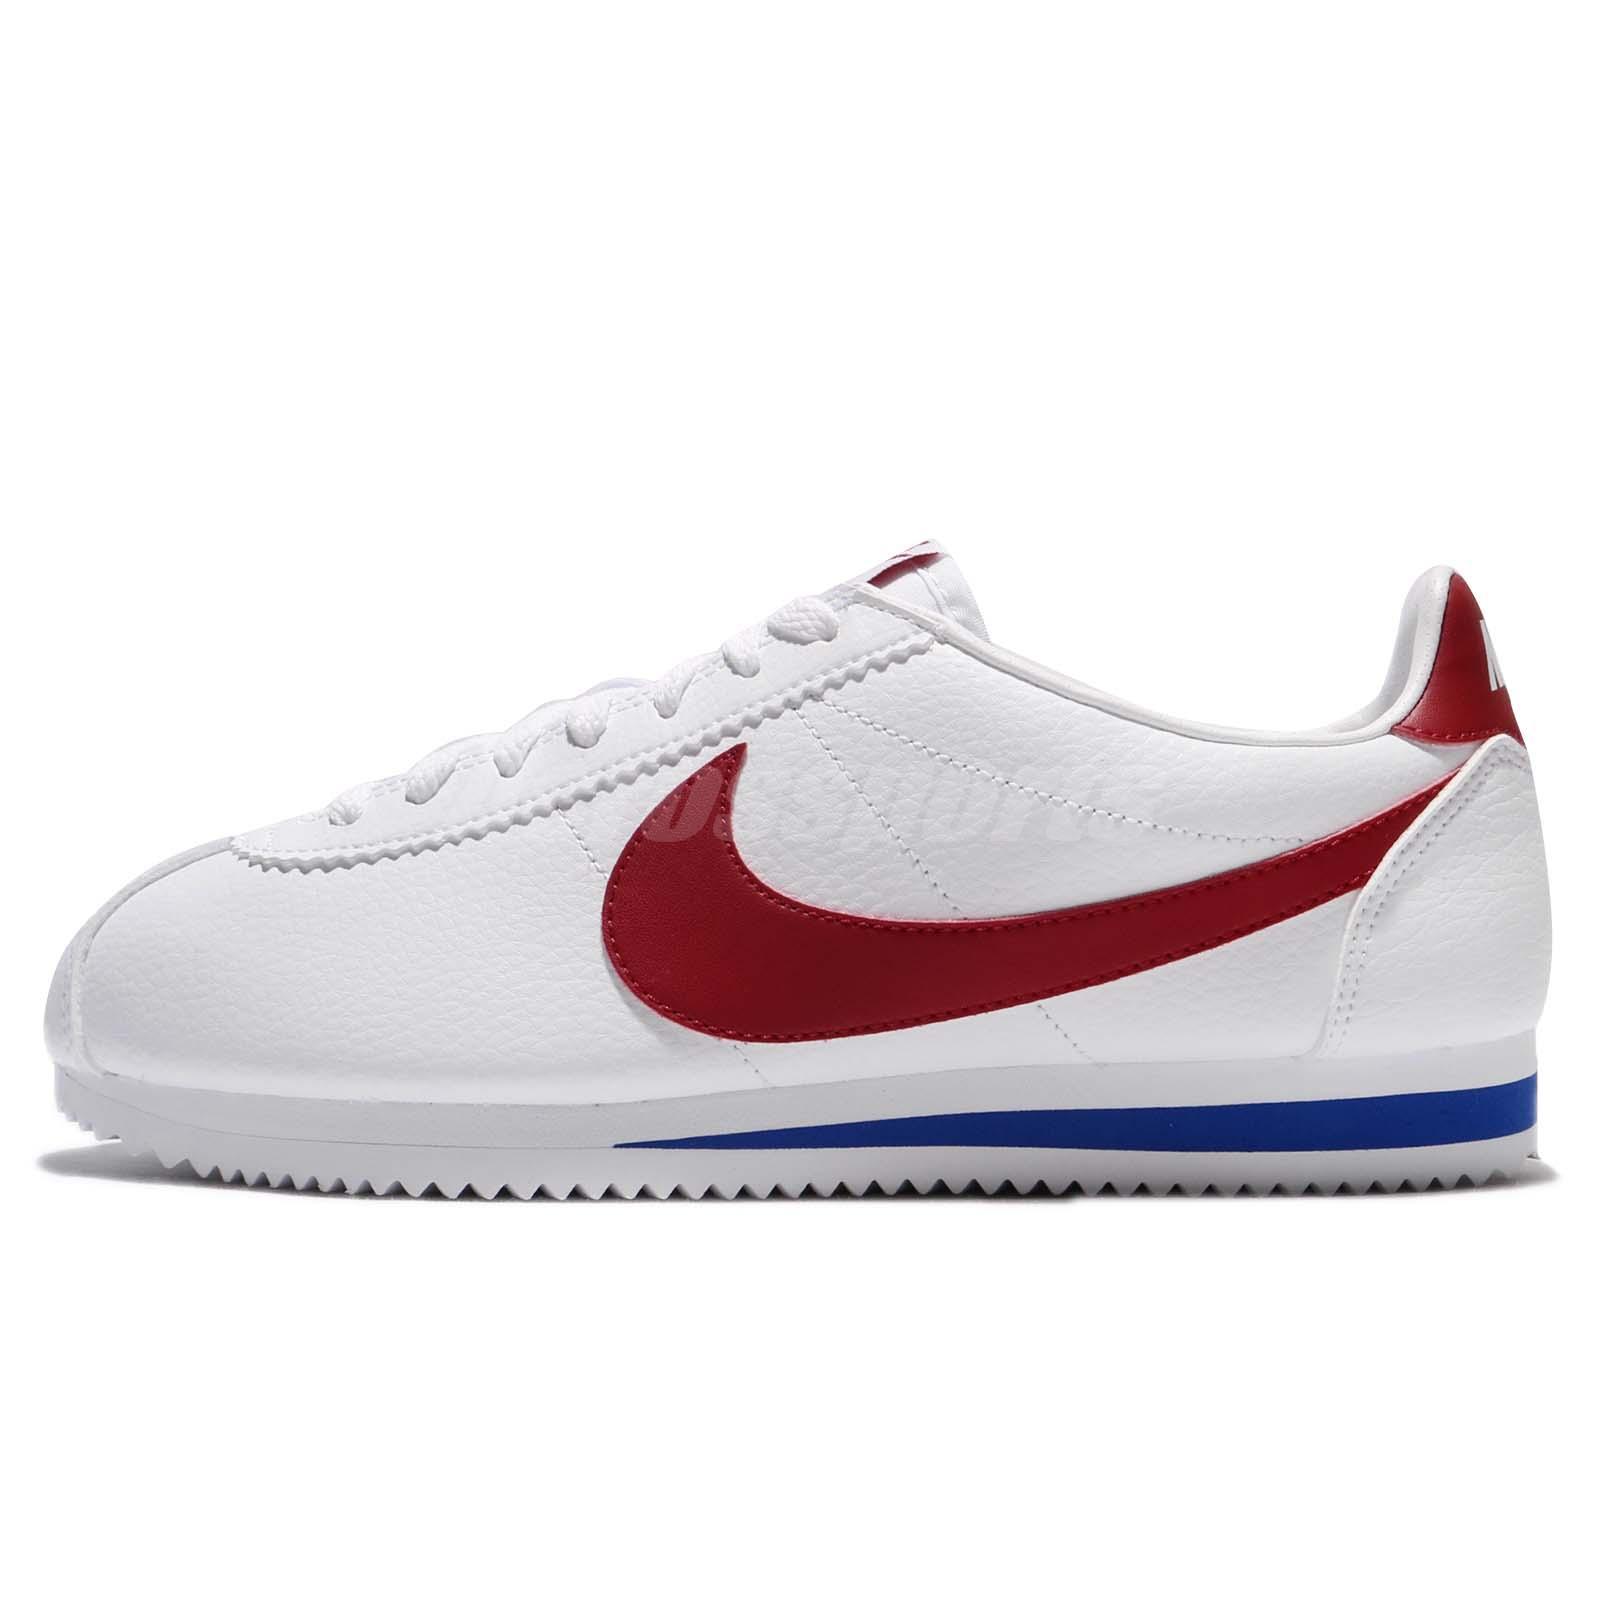 4db9d8ac ... best nike classic cortez leather forrest gump og white university red  men 749571 154 ea52b 9ccd8